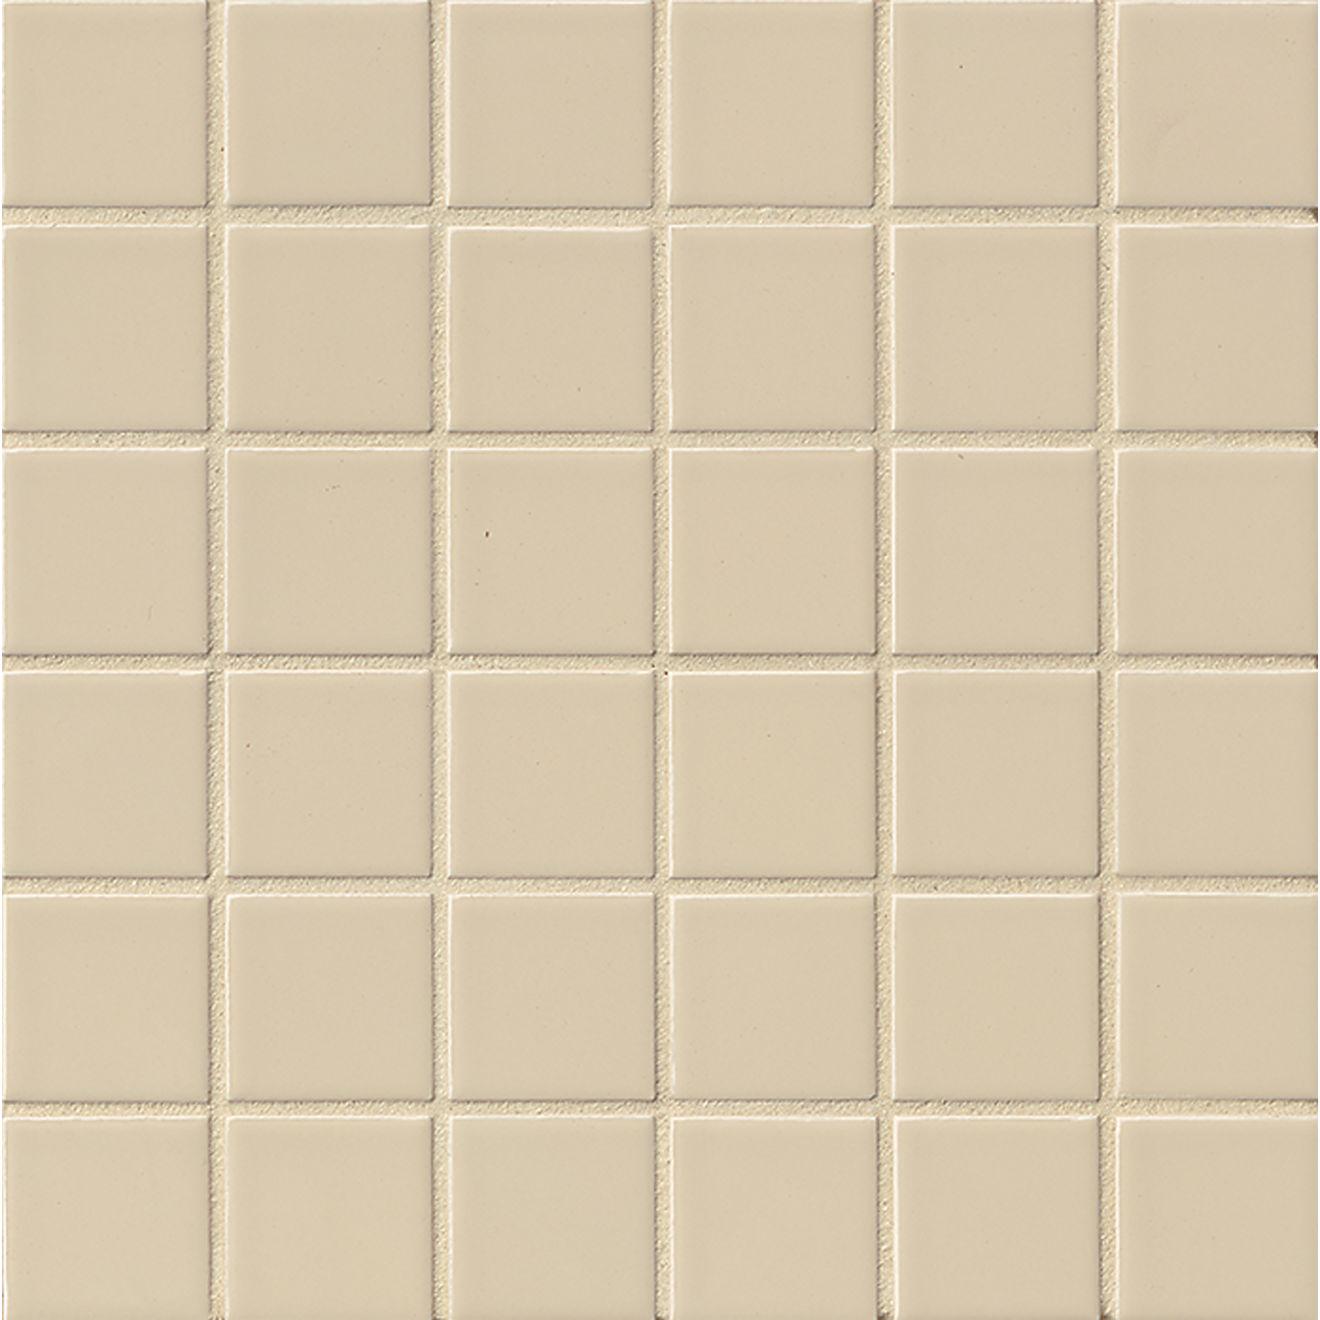 Elements Floor & Wall Mosaic in Biscuit